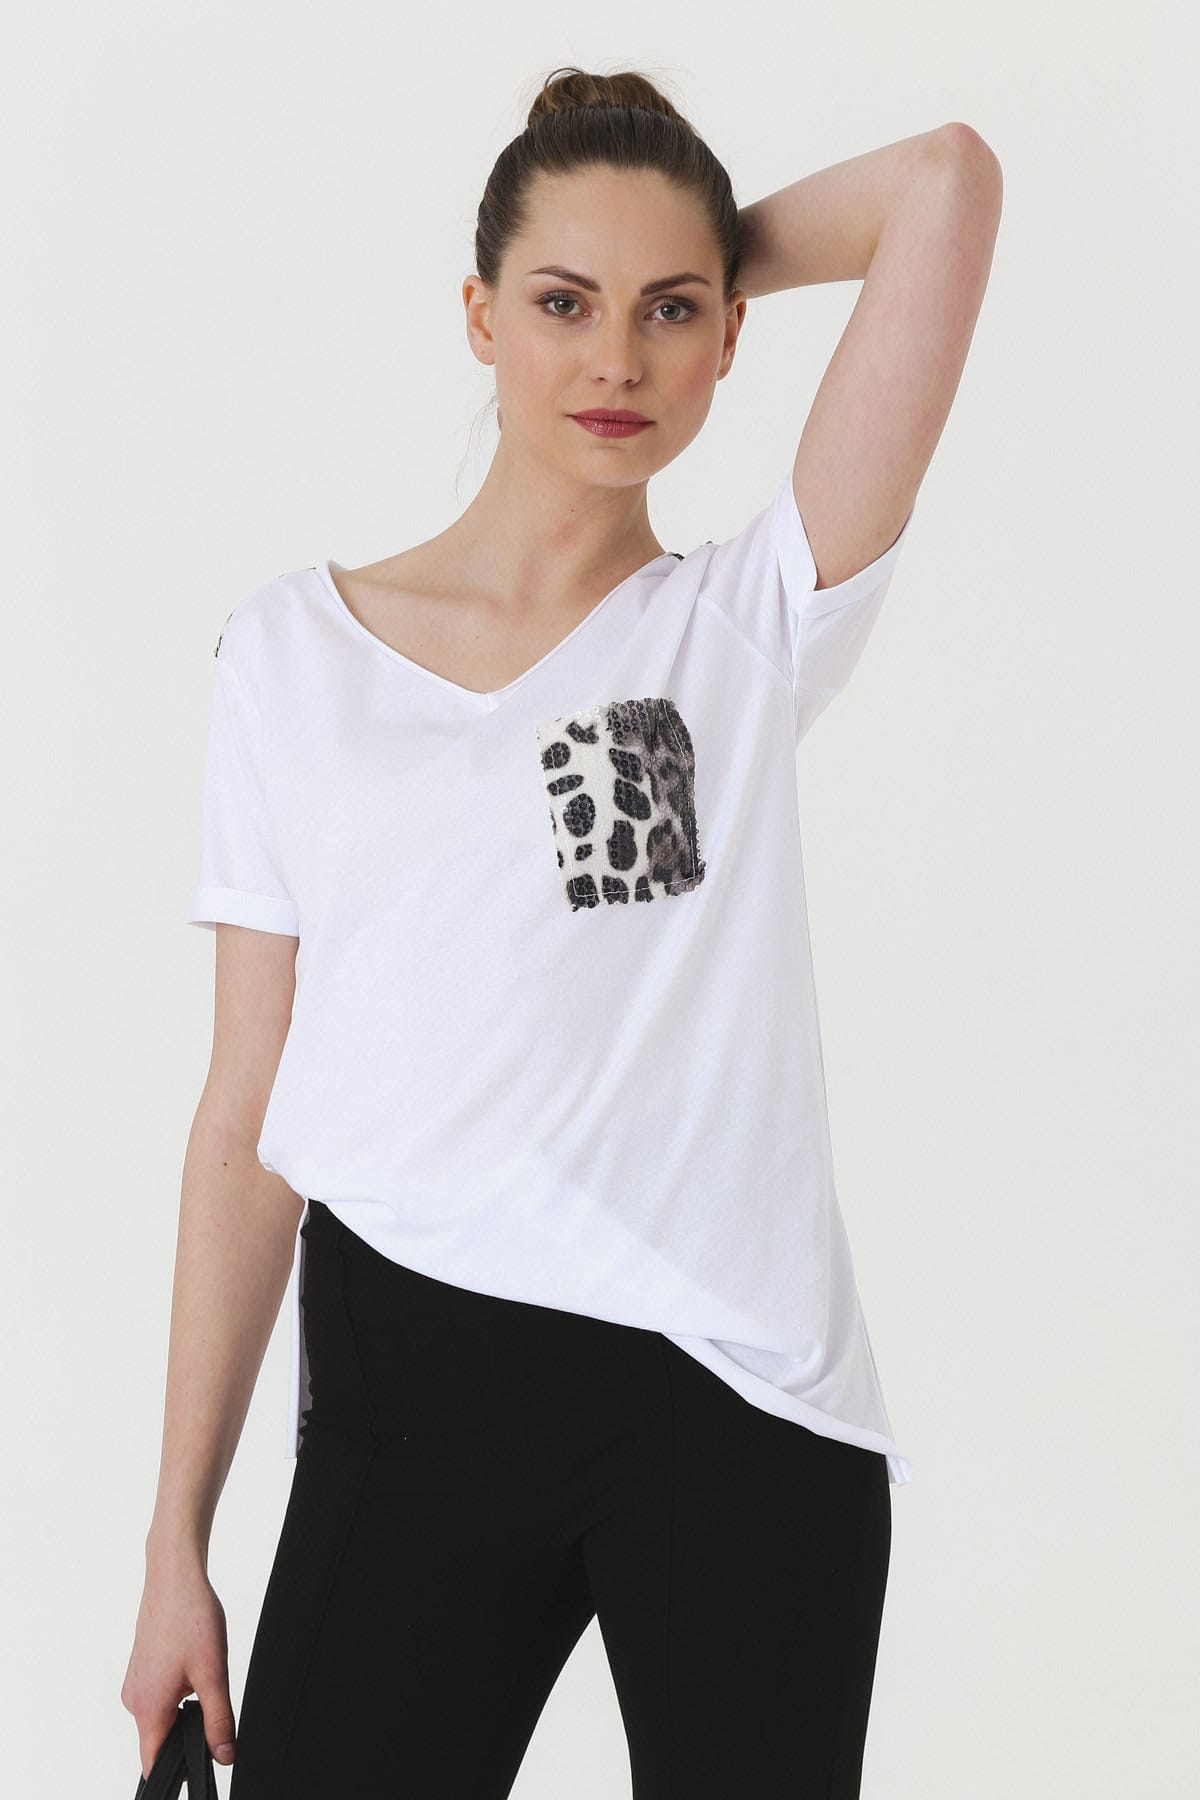 Jument Kadın Beyaz T-shirt 7090 1